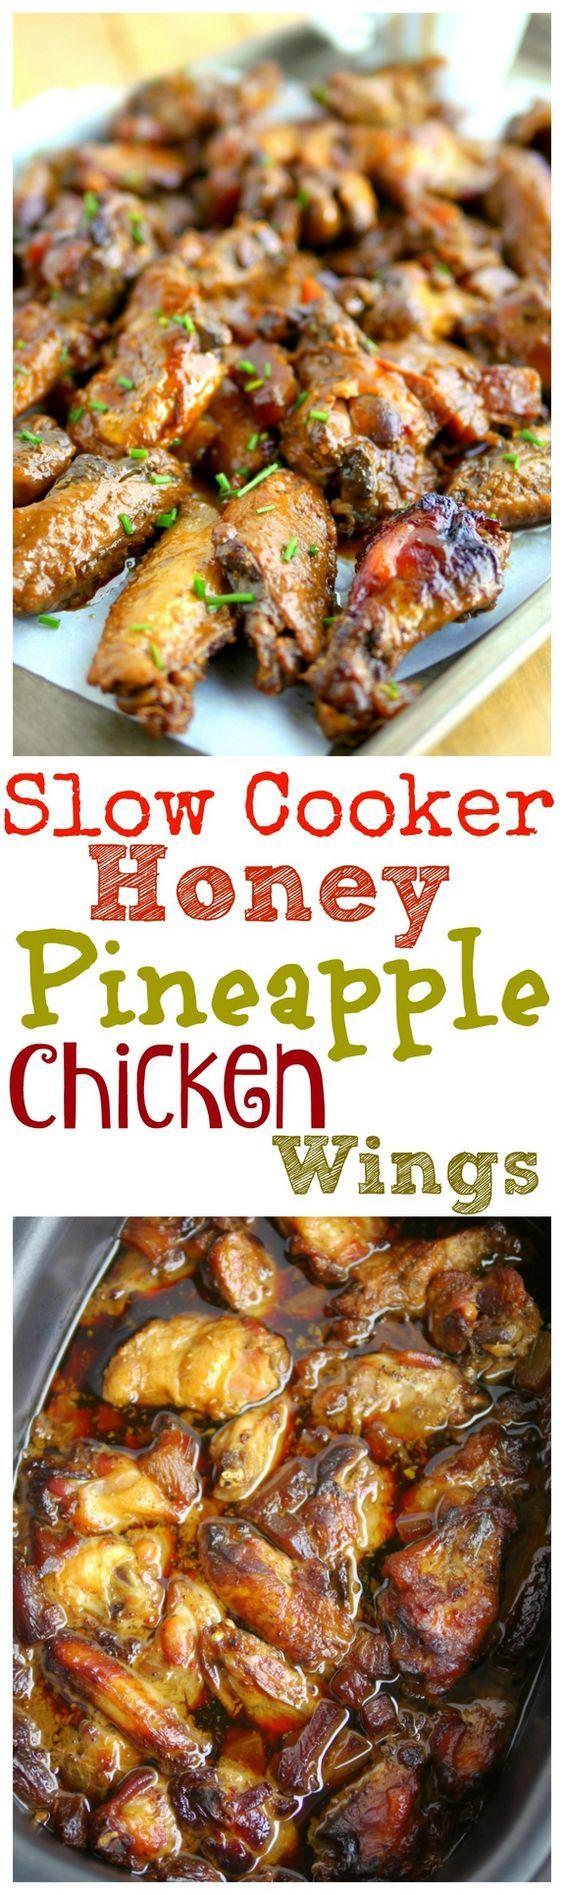 Slow Cooker Honey Pineapple Chicken Wings   Recipe